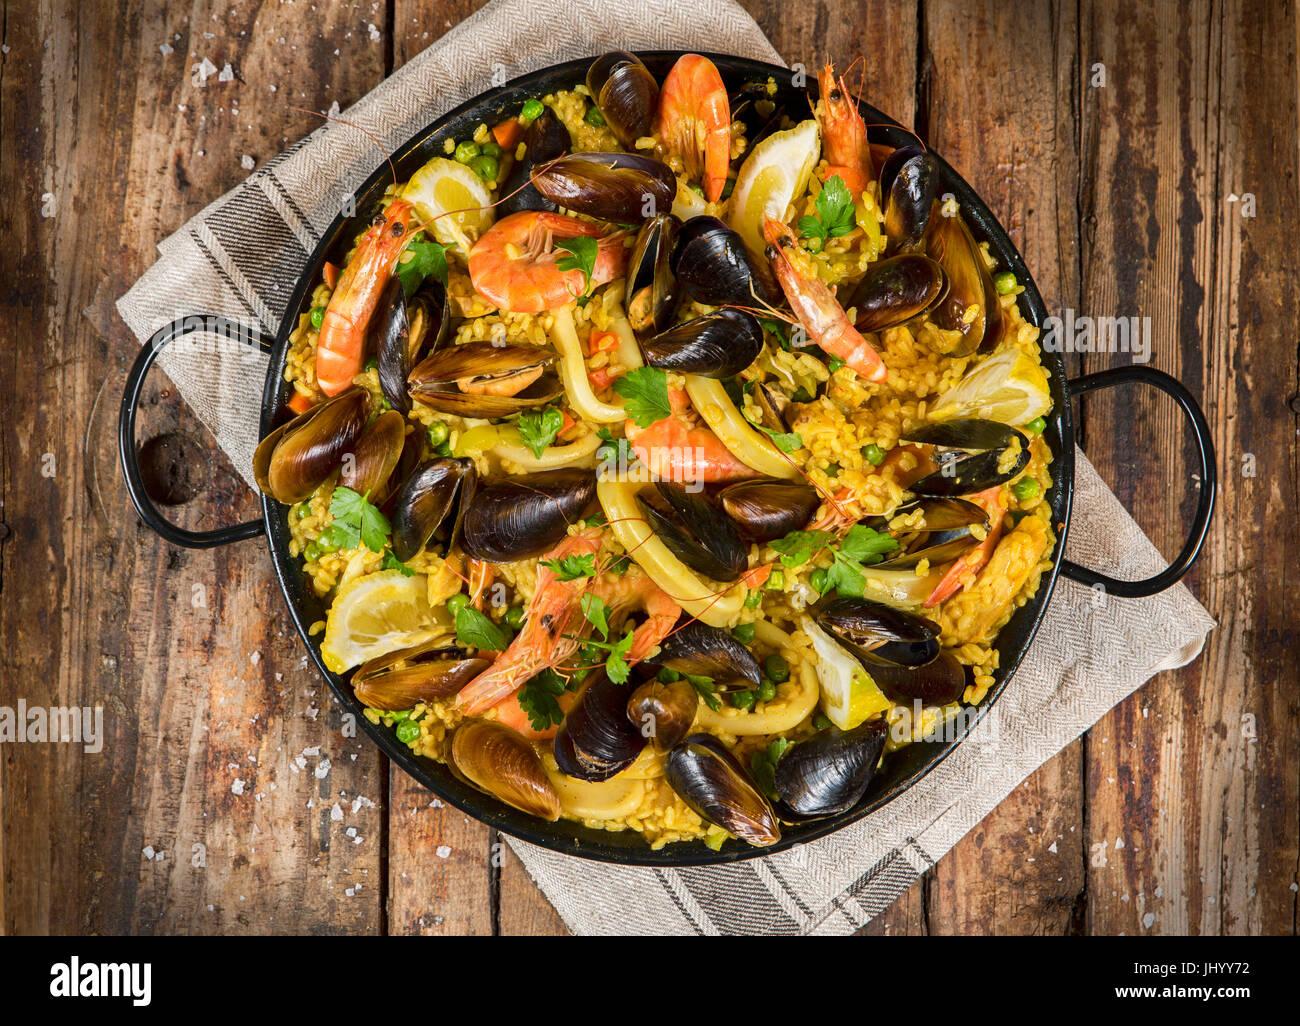 La tradicional paella Española rústica Foto de stock